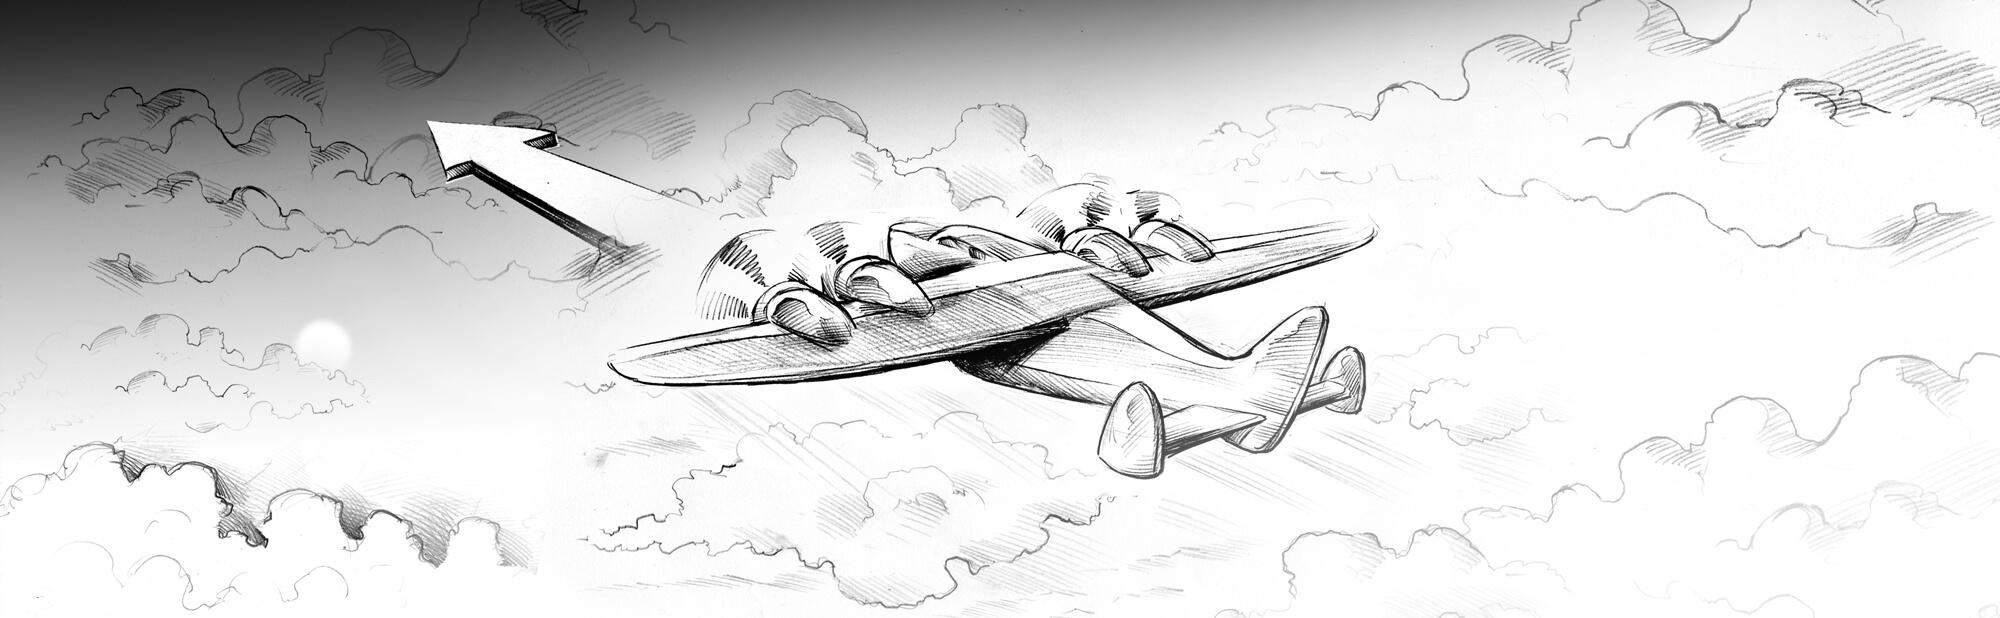 Plane_1_Webt